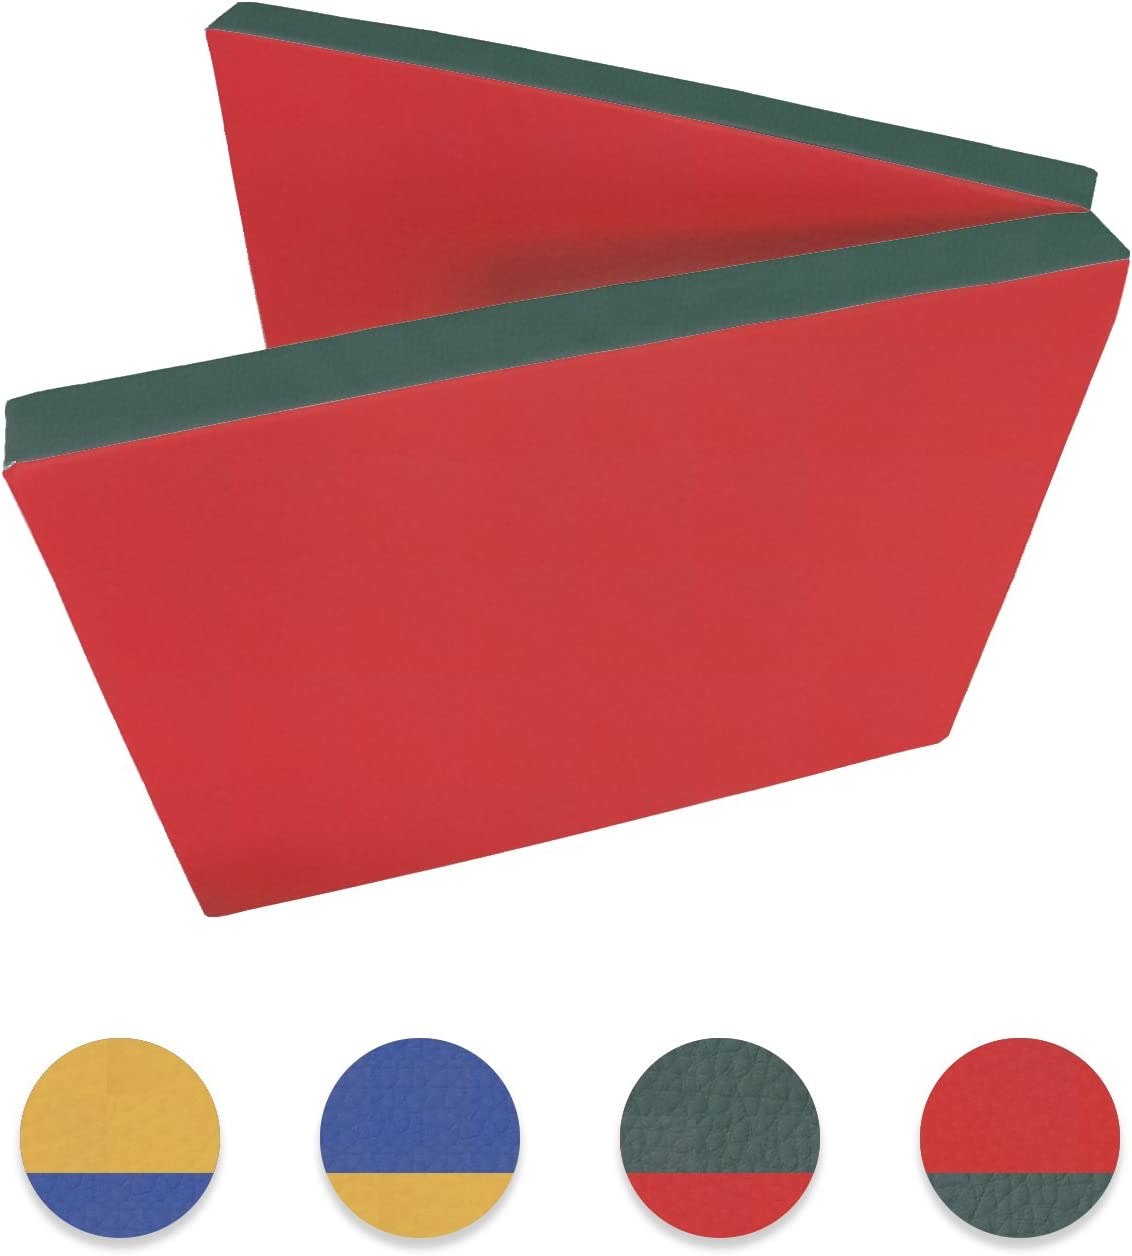 Niro Sport colchoneta 200 x 80 x 8 cm Estera de Gimnasia (Sport Matte Entrenamiento – Colchoneta Deportiva Resistente al Agua Plegable, Rojo/Verde: Amazon.es: Deportes y aire libre